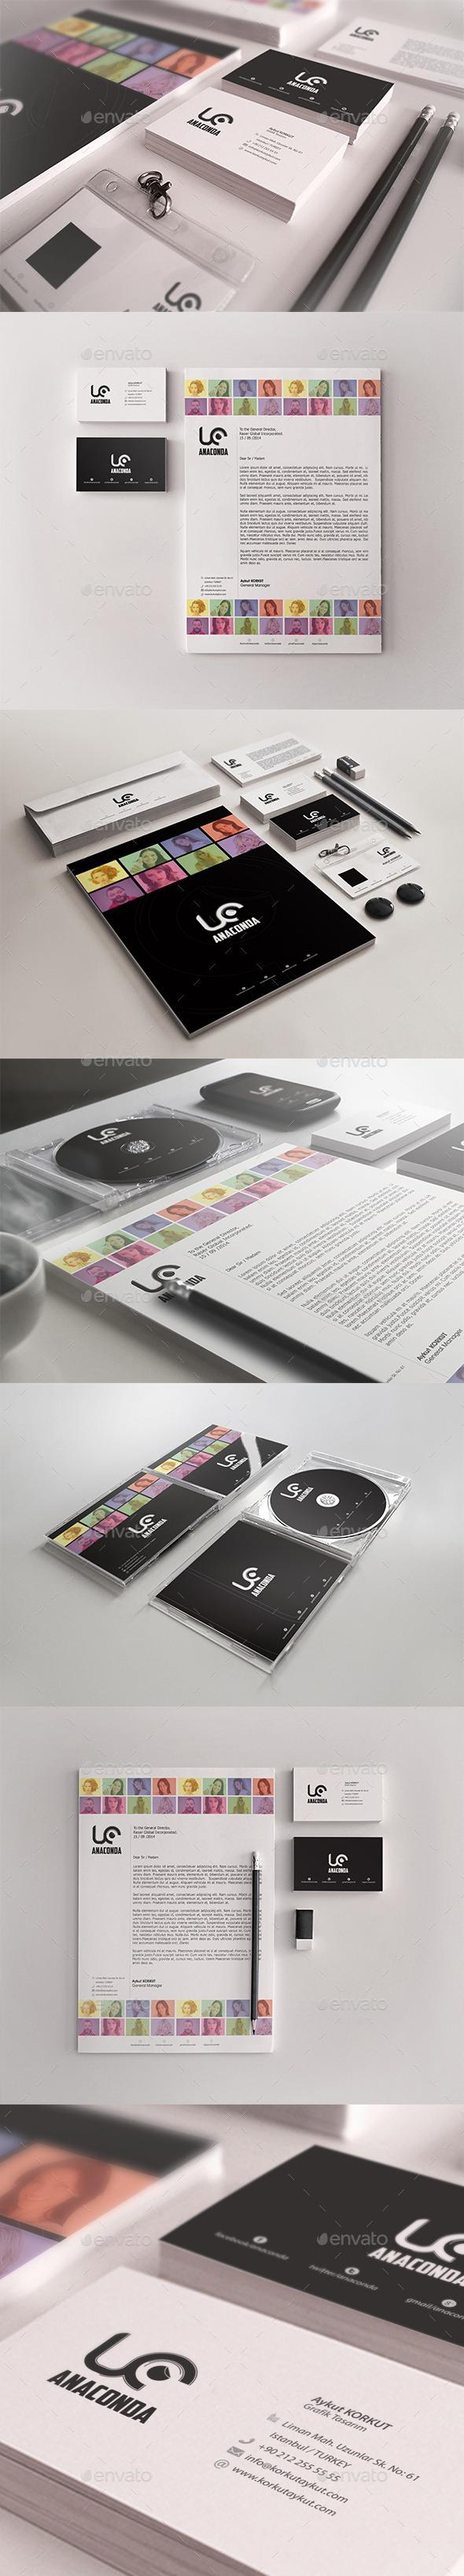 Anaconda Corporate Identity Package - Stationery Print Templates